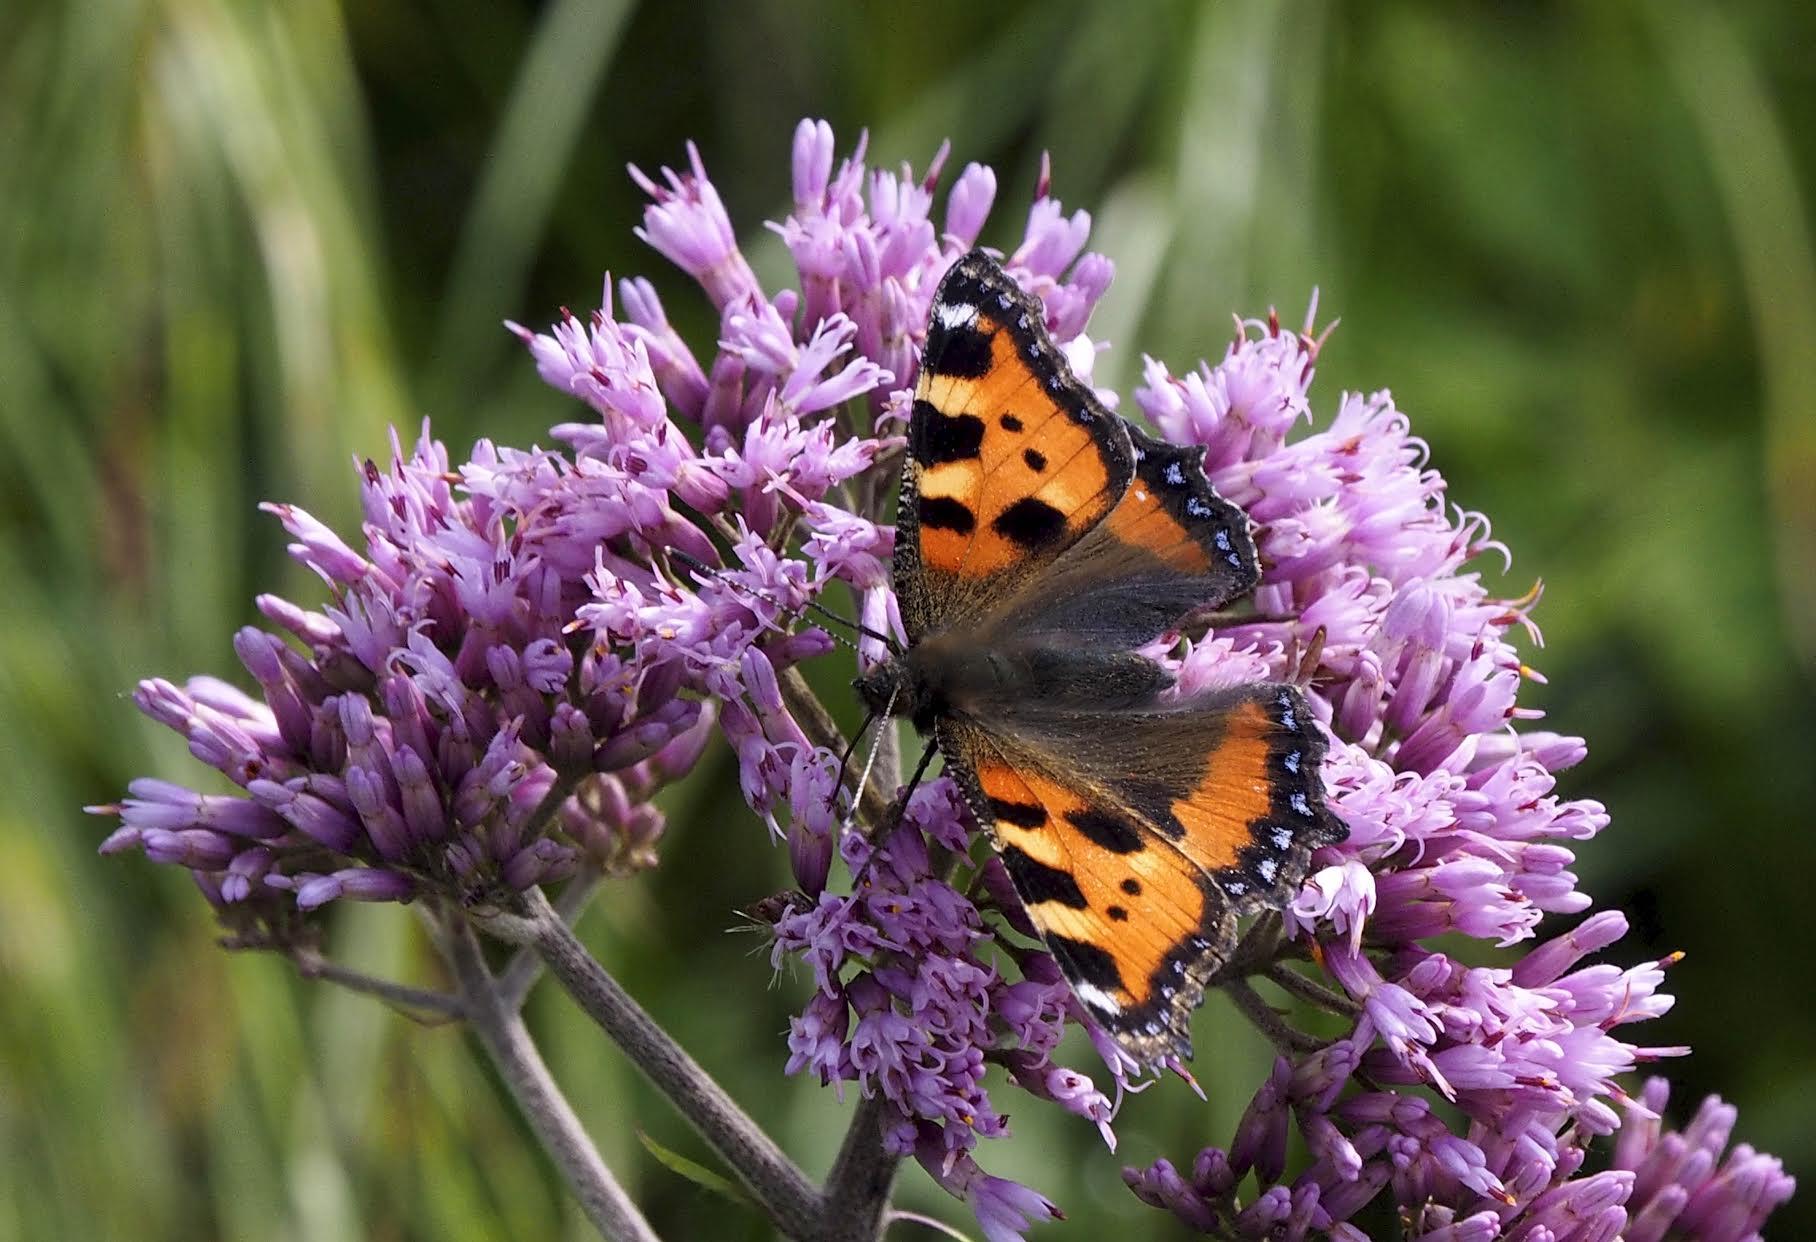 D. Pumplin, Butterfly on Composite Flower, Italy